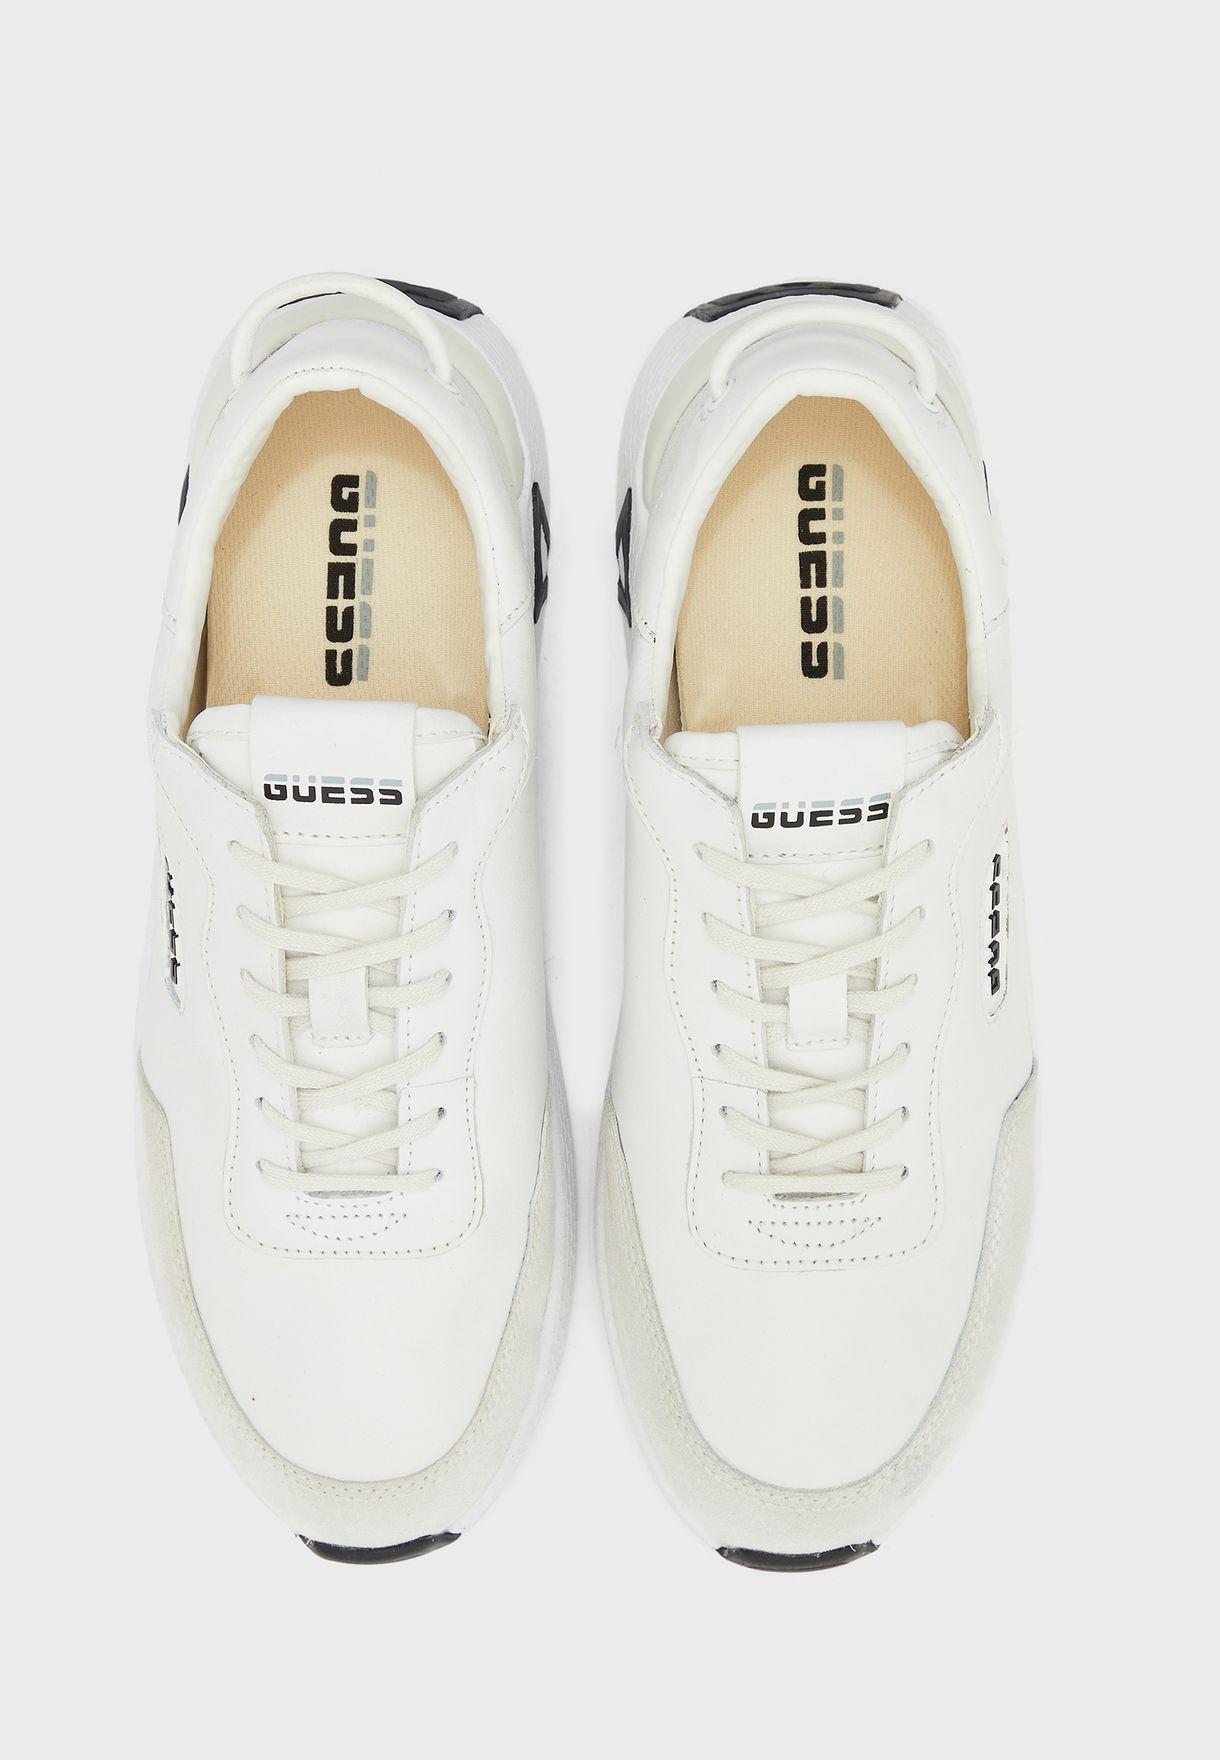 Modena Low Top Sneakers